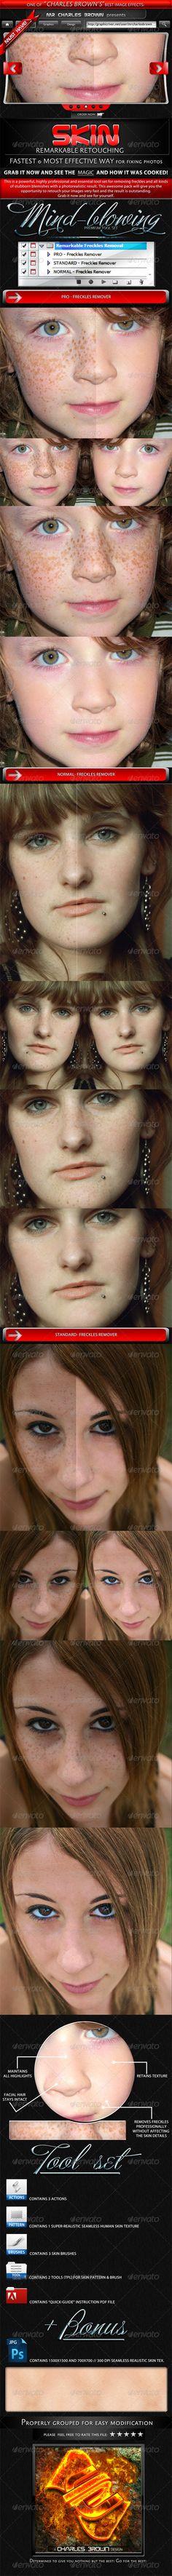 Remarkable skin retouching